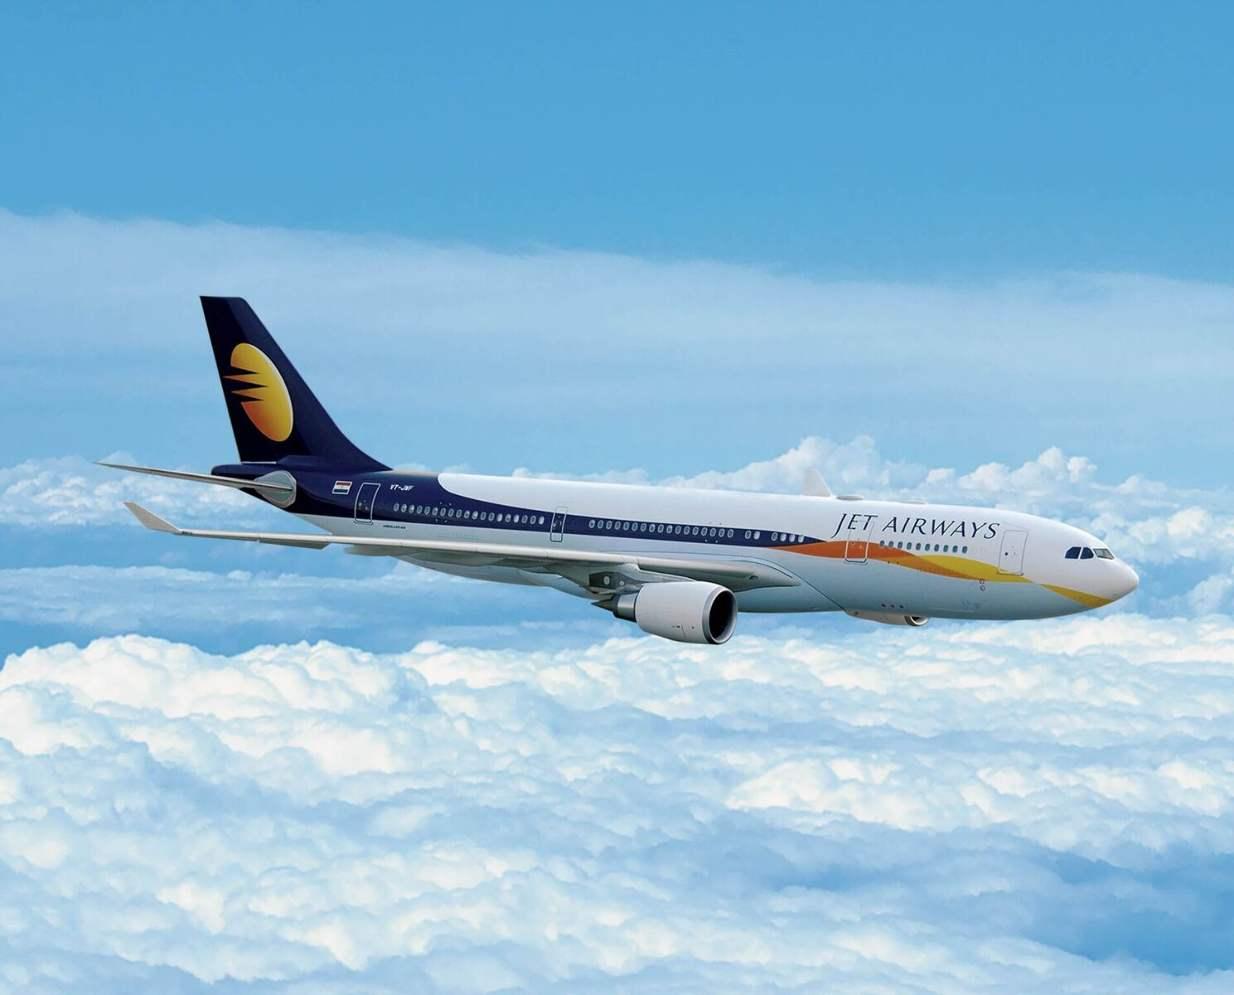 Air France-KLM, Jet Airways strengthen cooperation